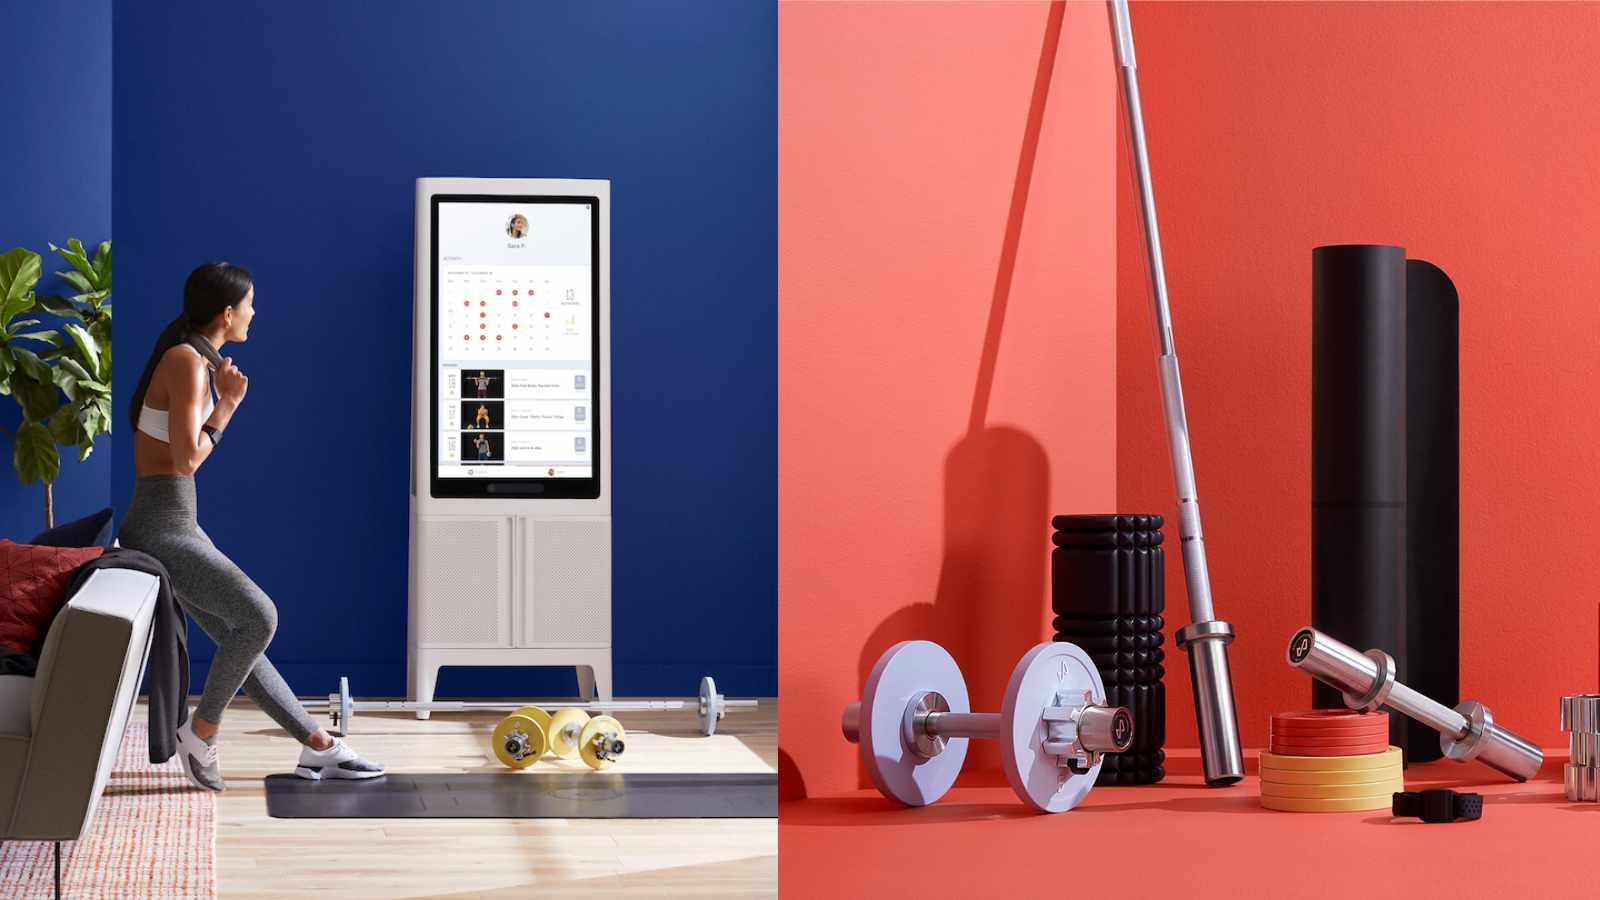 tempo studio fitness equipment